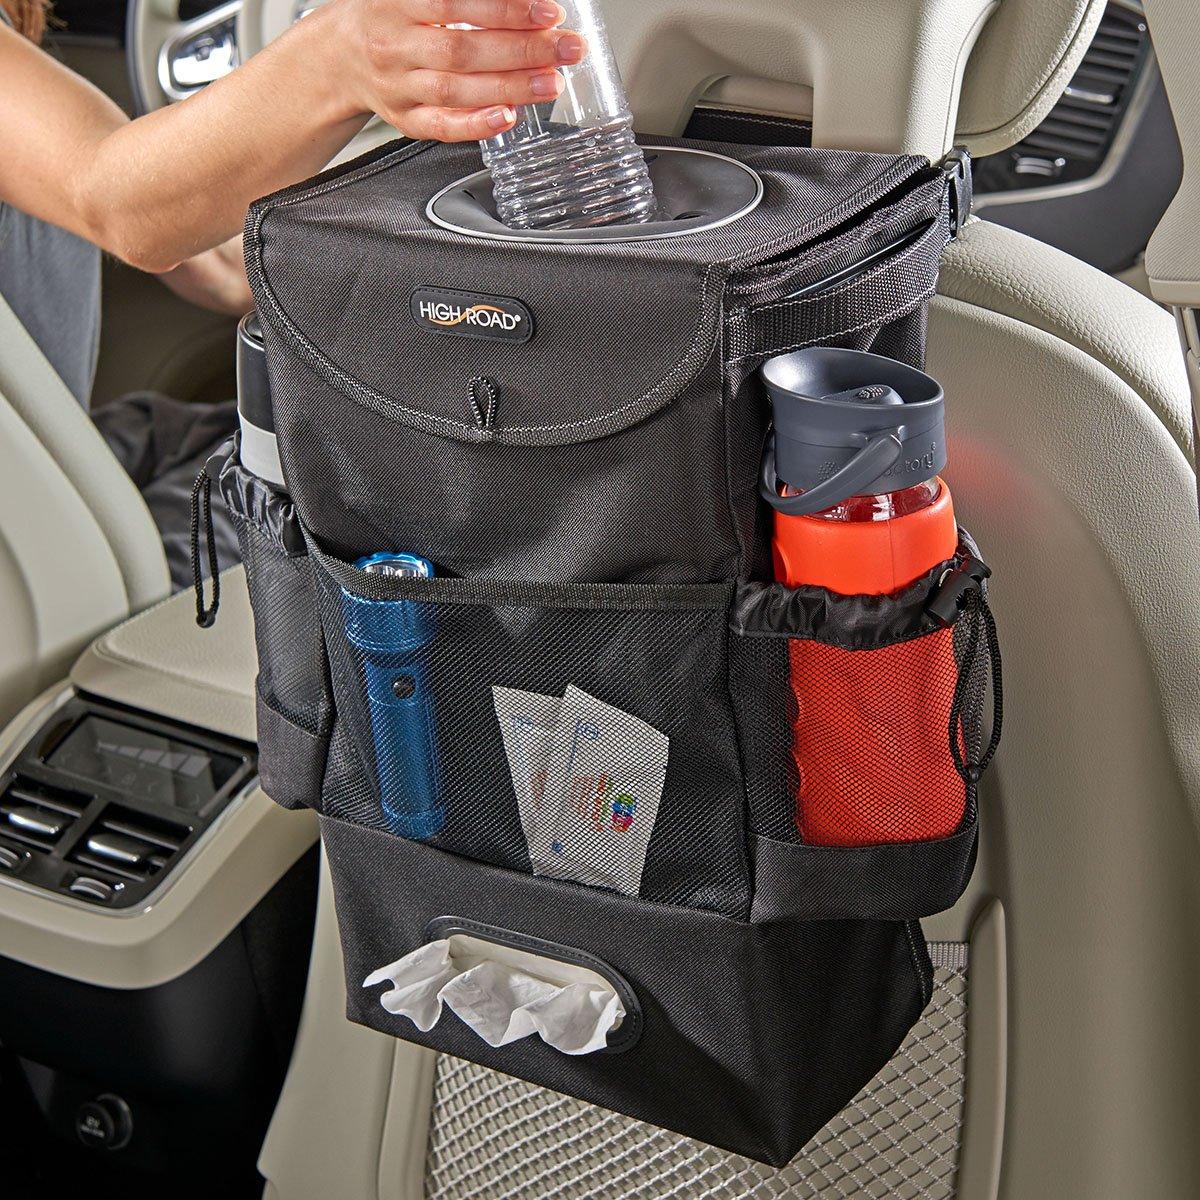 High Road StashAway Car Seat Back Organizer, Trash Bag and Tissue Holder SPOMHNK993